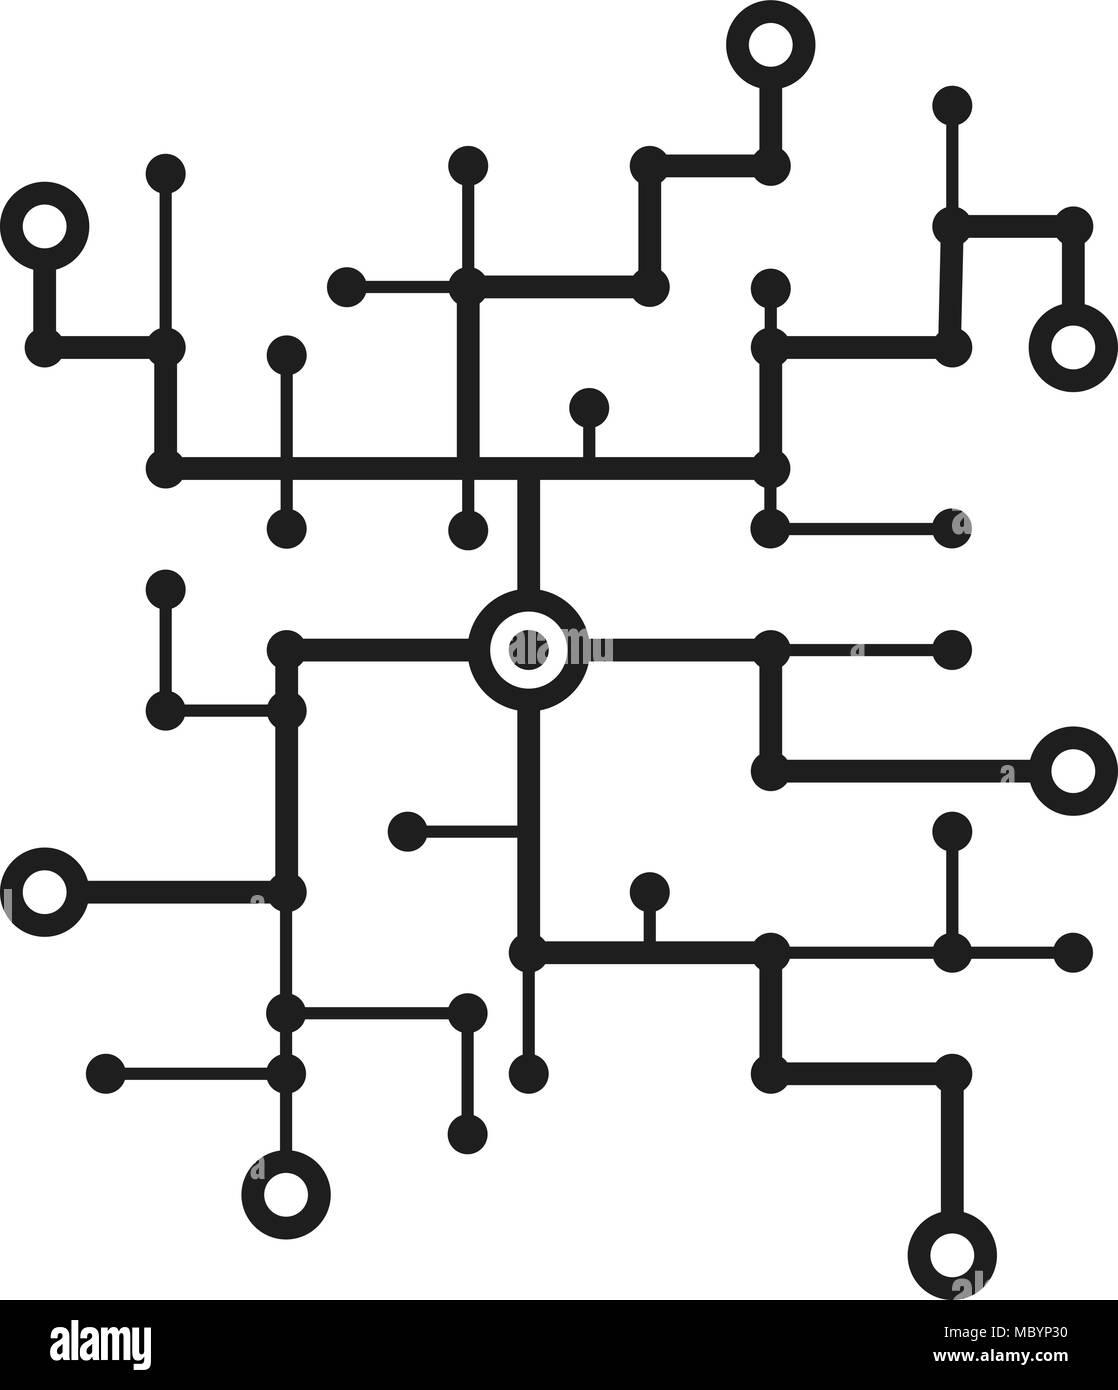 Circuit Line Stockfotos & Circuit Line Bilder - Alamy